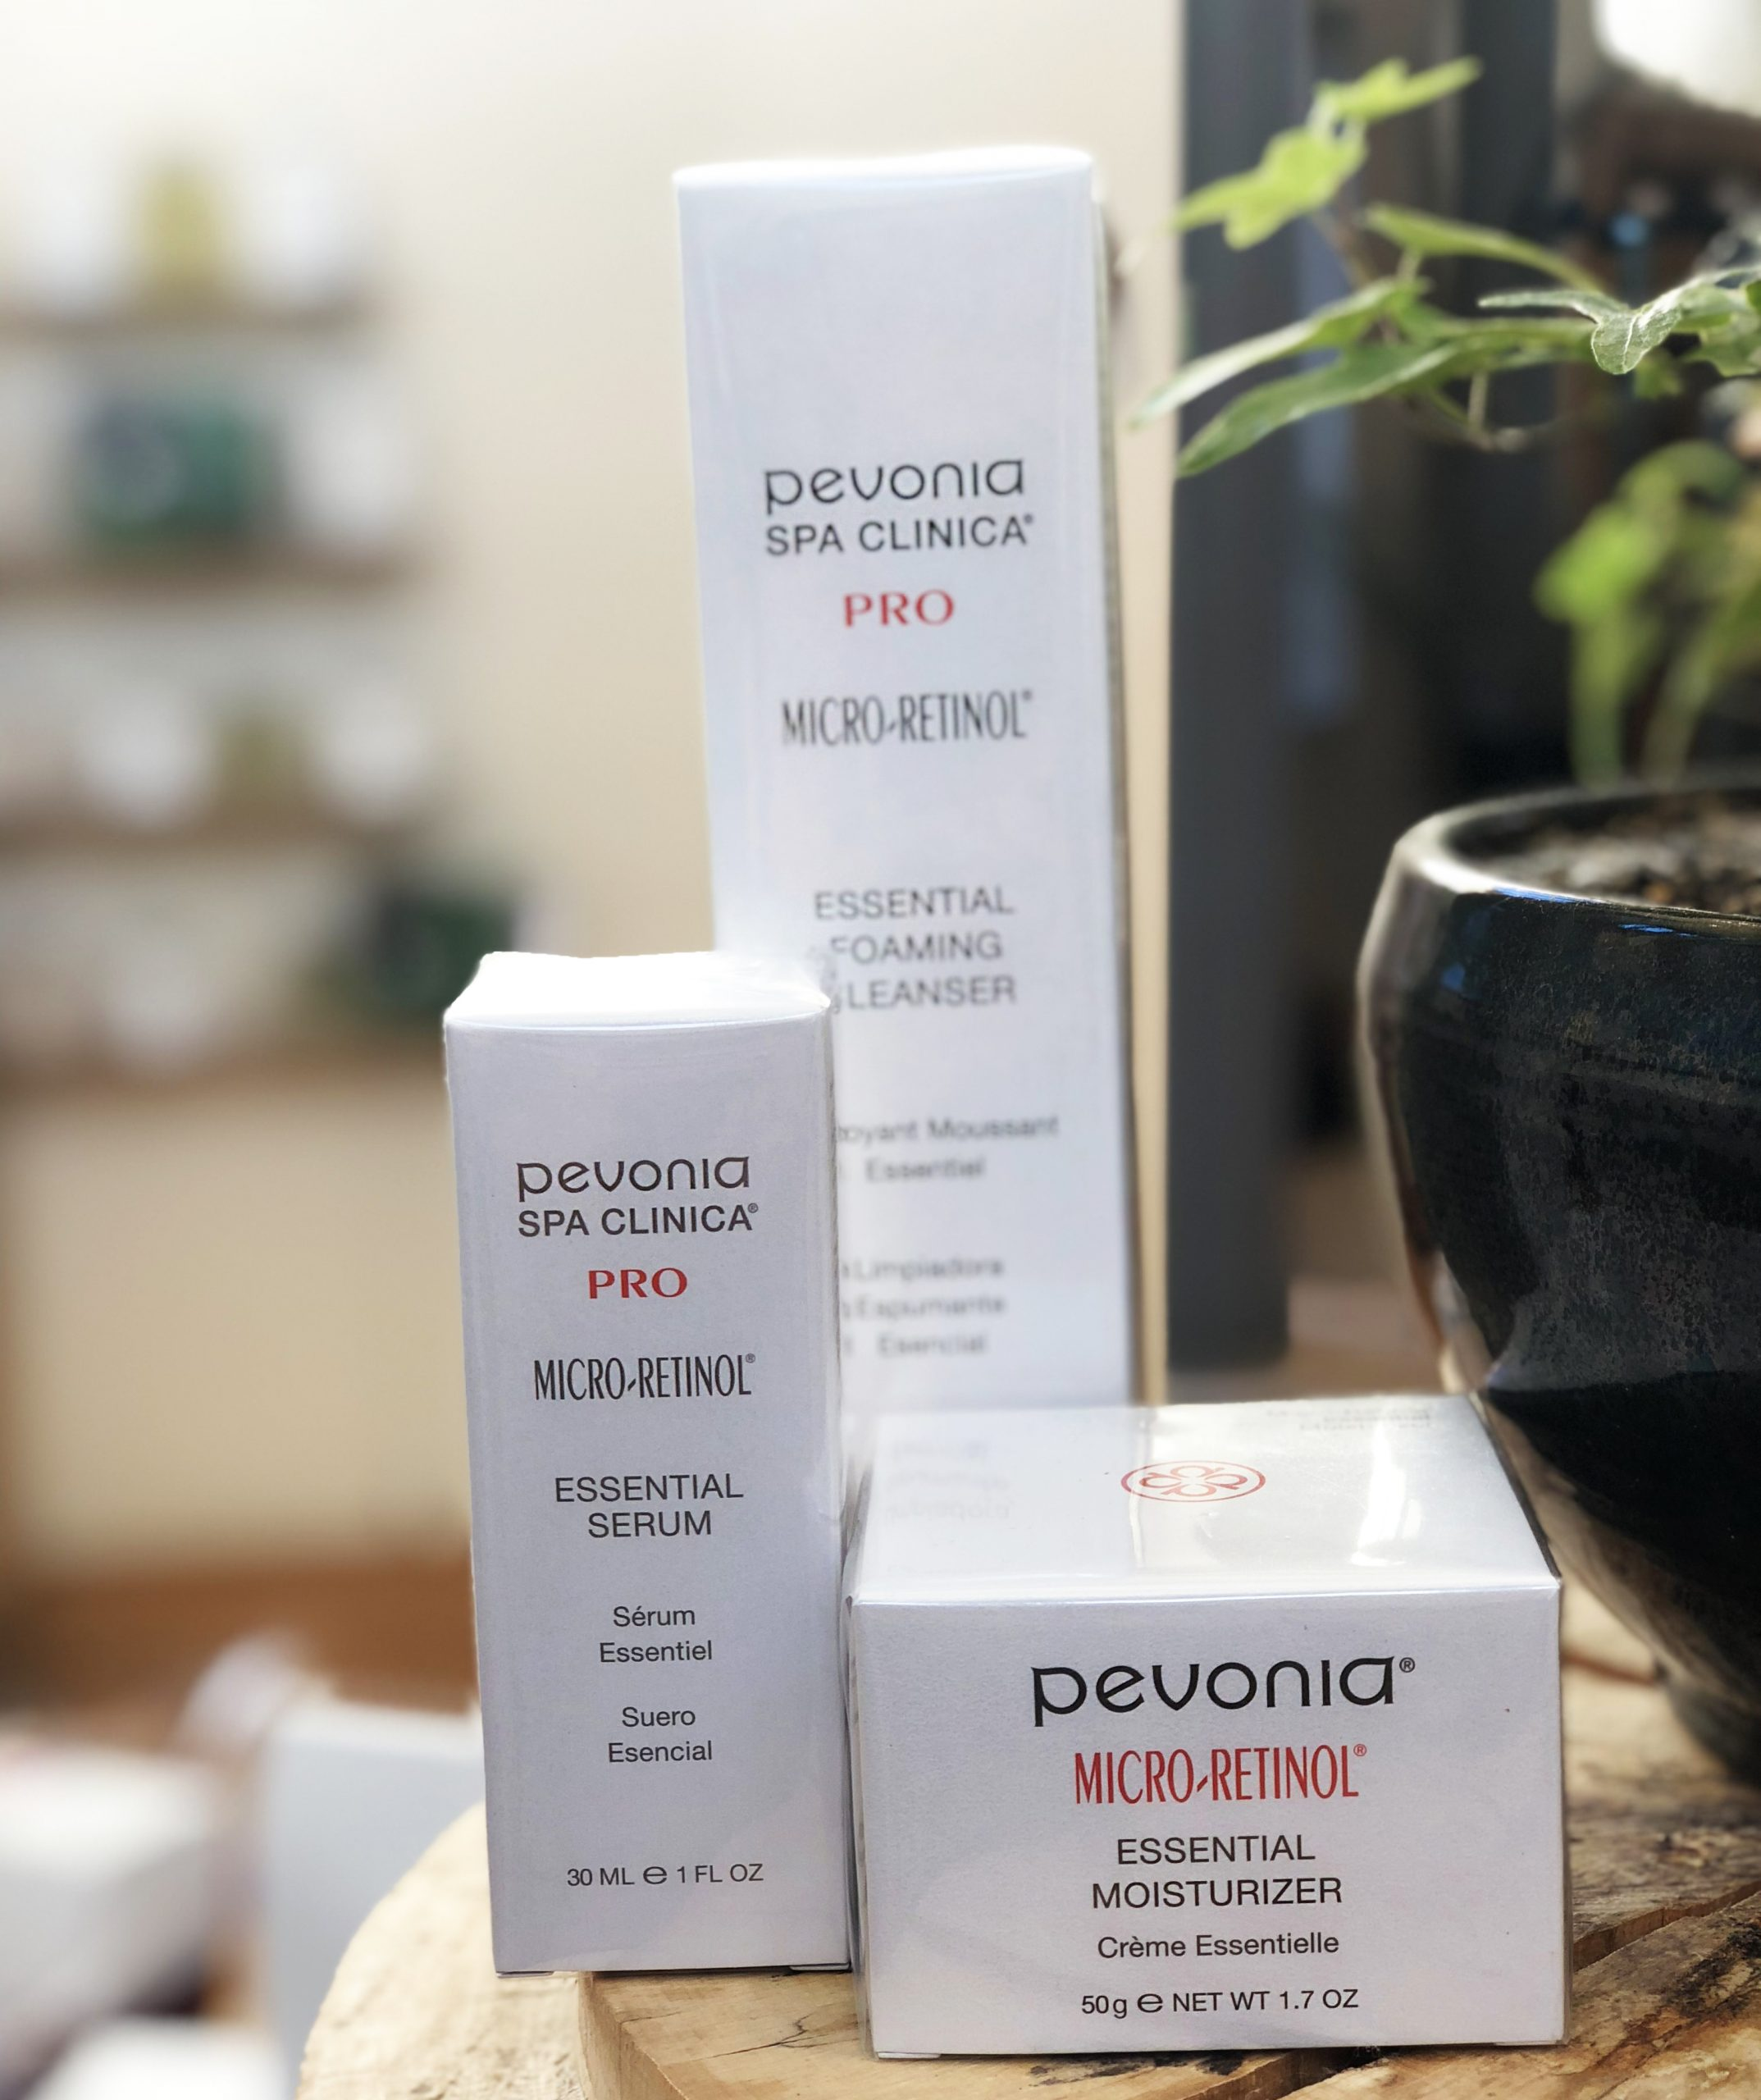 Micro retinol Pevonia products